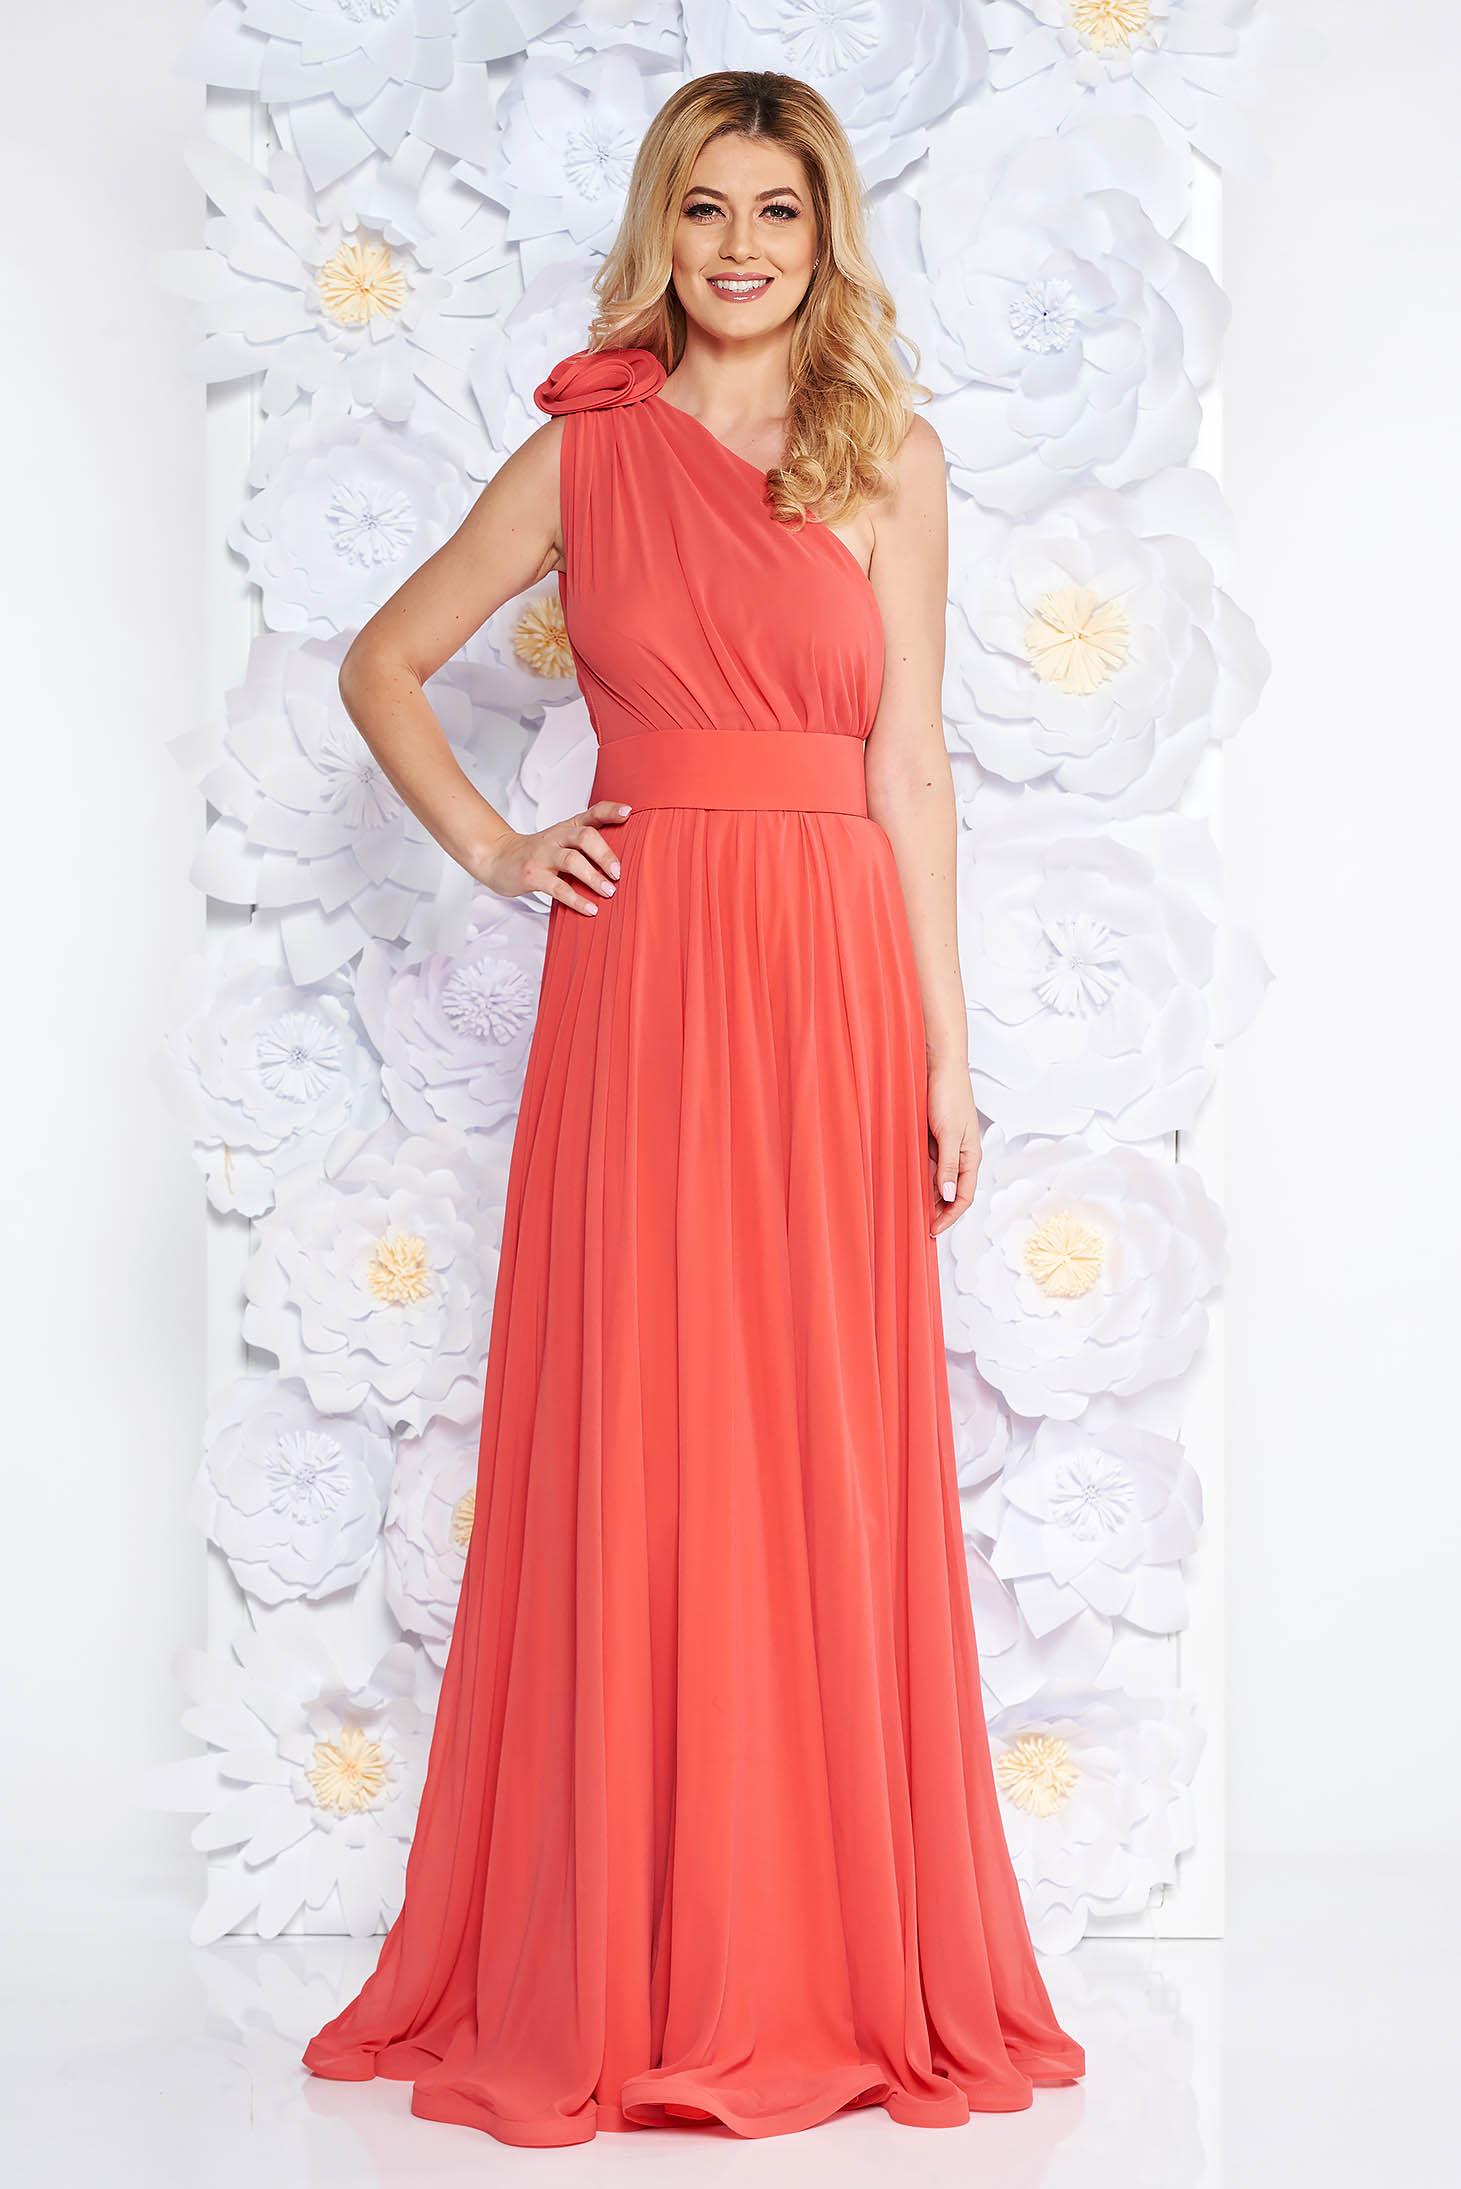 Ana Radu orange voile fabric one shoulder dress luxurious accessorized with tied waistband